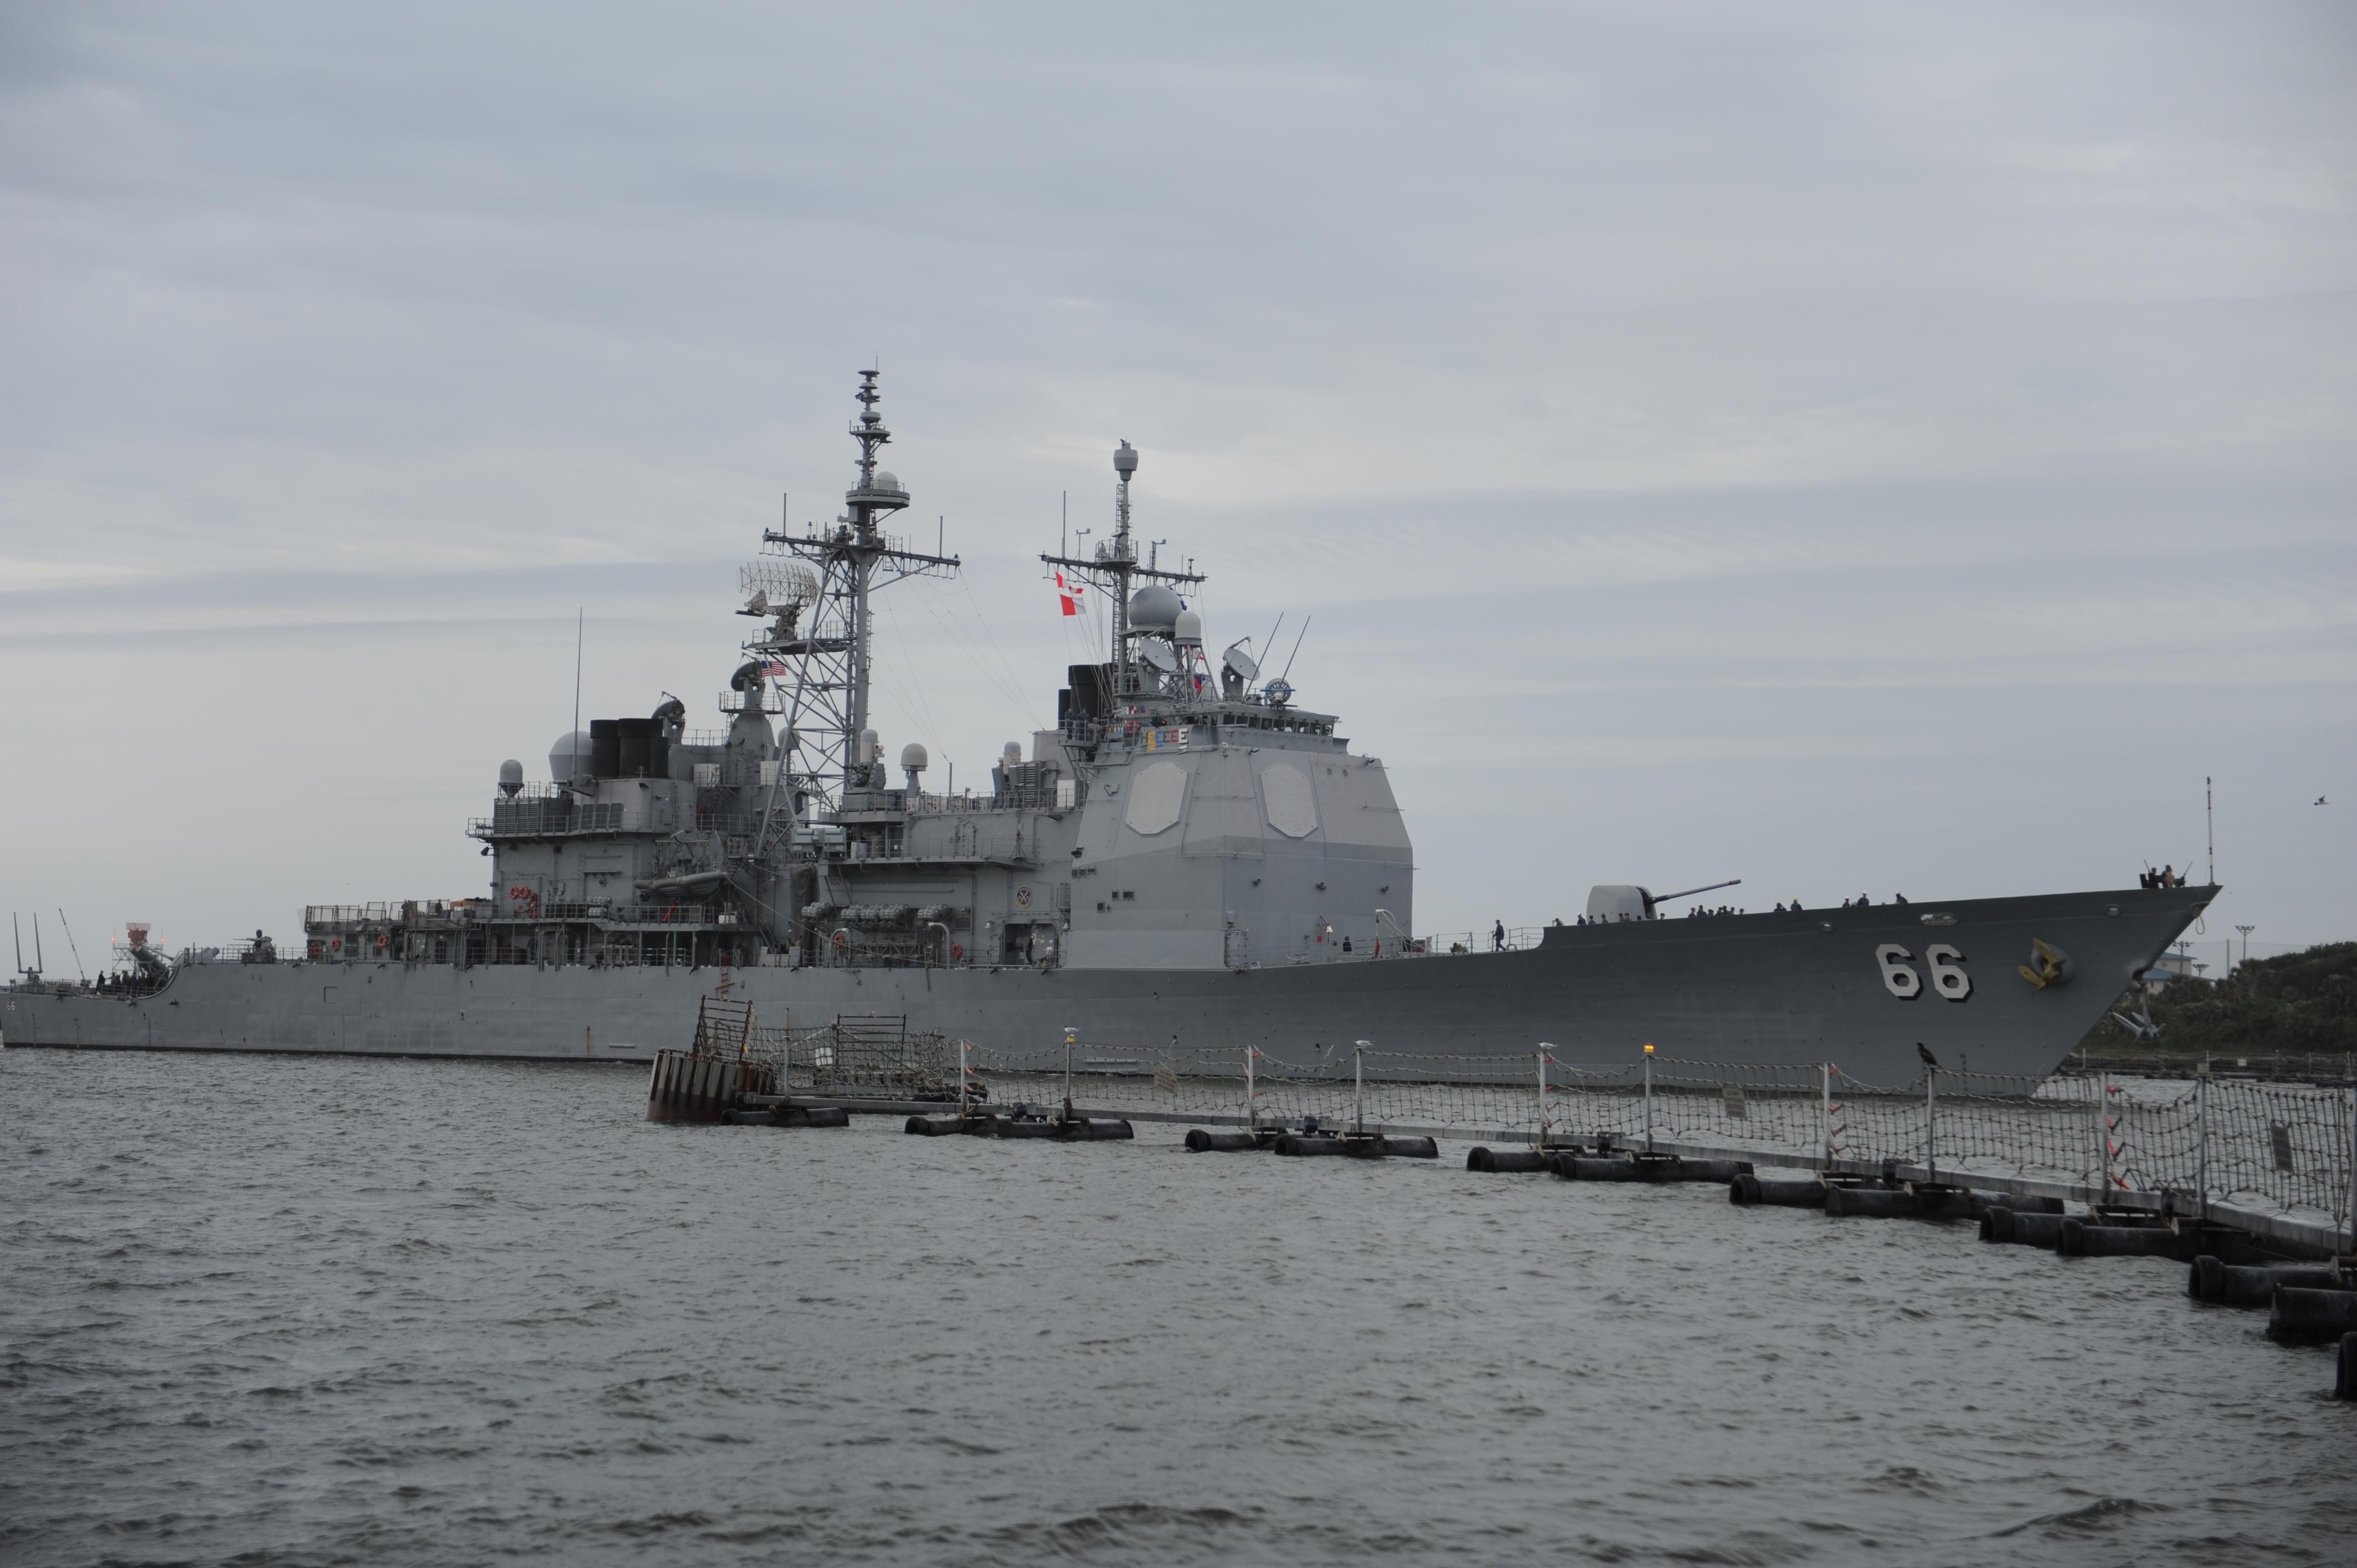 USS HUE CITY CG-66 Einlaufen Mayport 18.04.2014 Bild: U.S. Navy